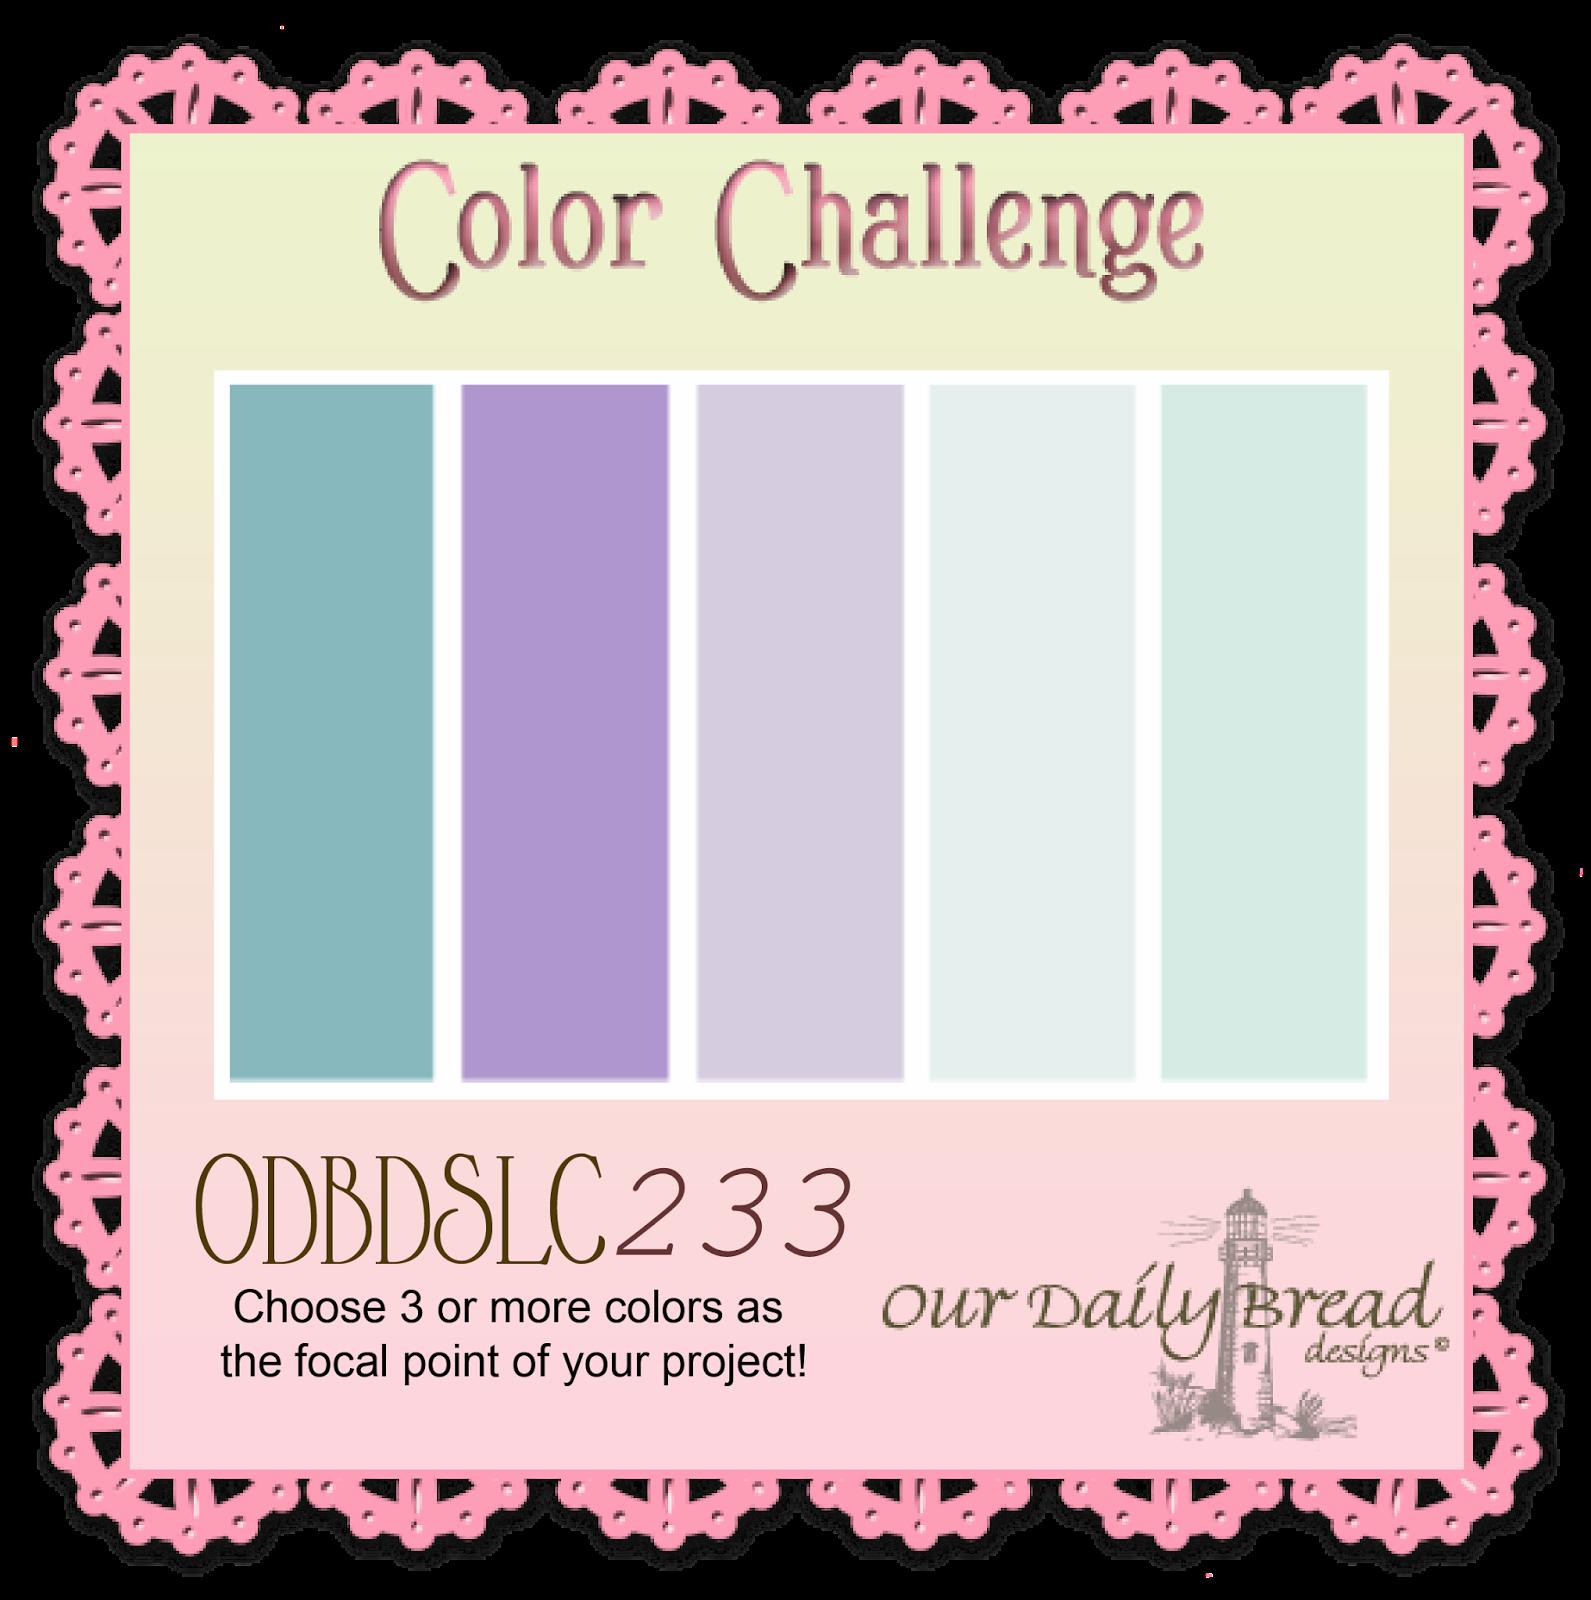 http://www.ourdailybreaddesignsblog.blogspot.com/2015/04/odbdslc233-color-challenge.html